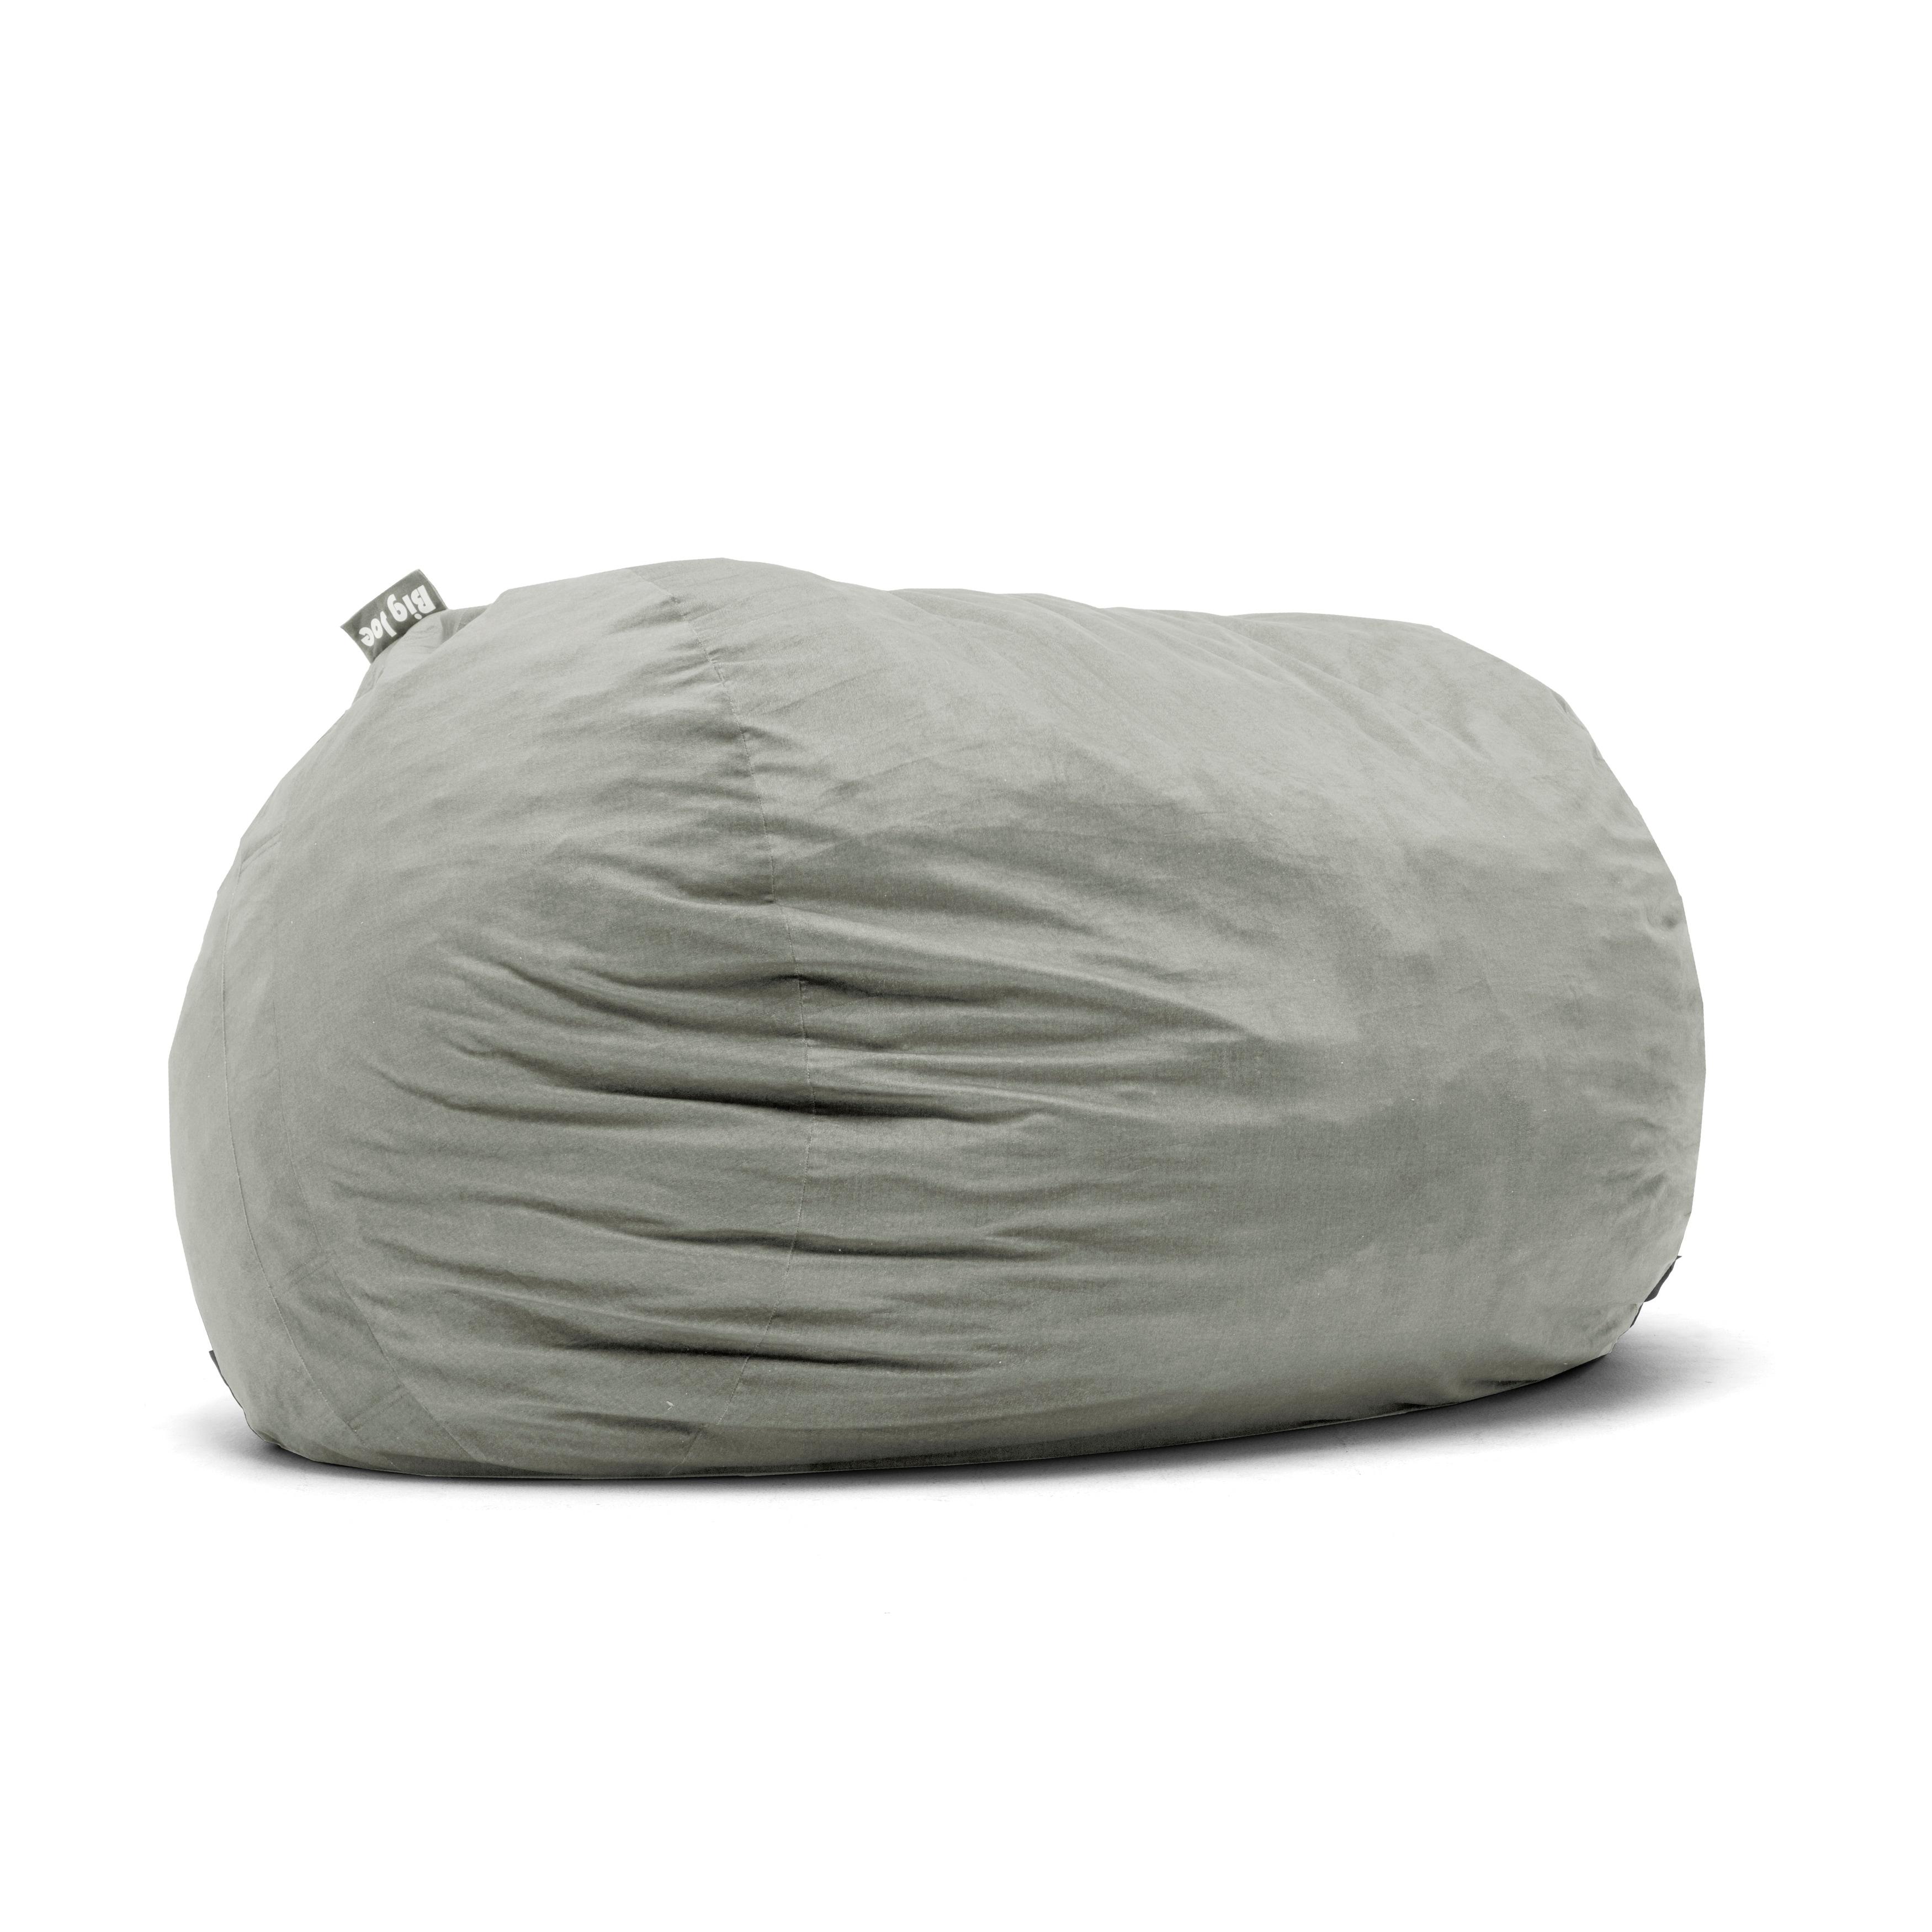 Magnificent Big Joe Xxl Bean Bag Fuf W Removable Cover Inzonedesignstudio Interior Chair Design Inzonedesignstudiocom